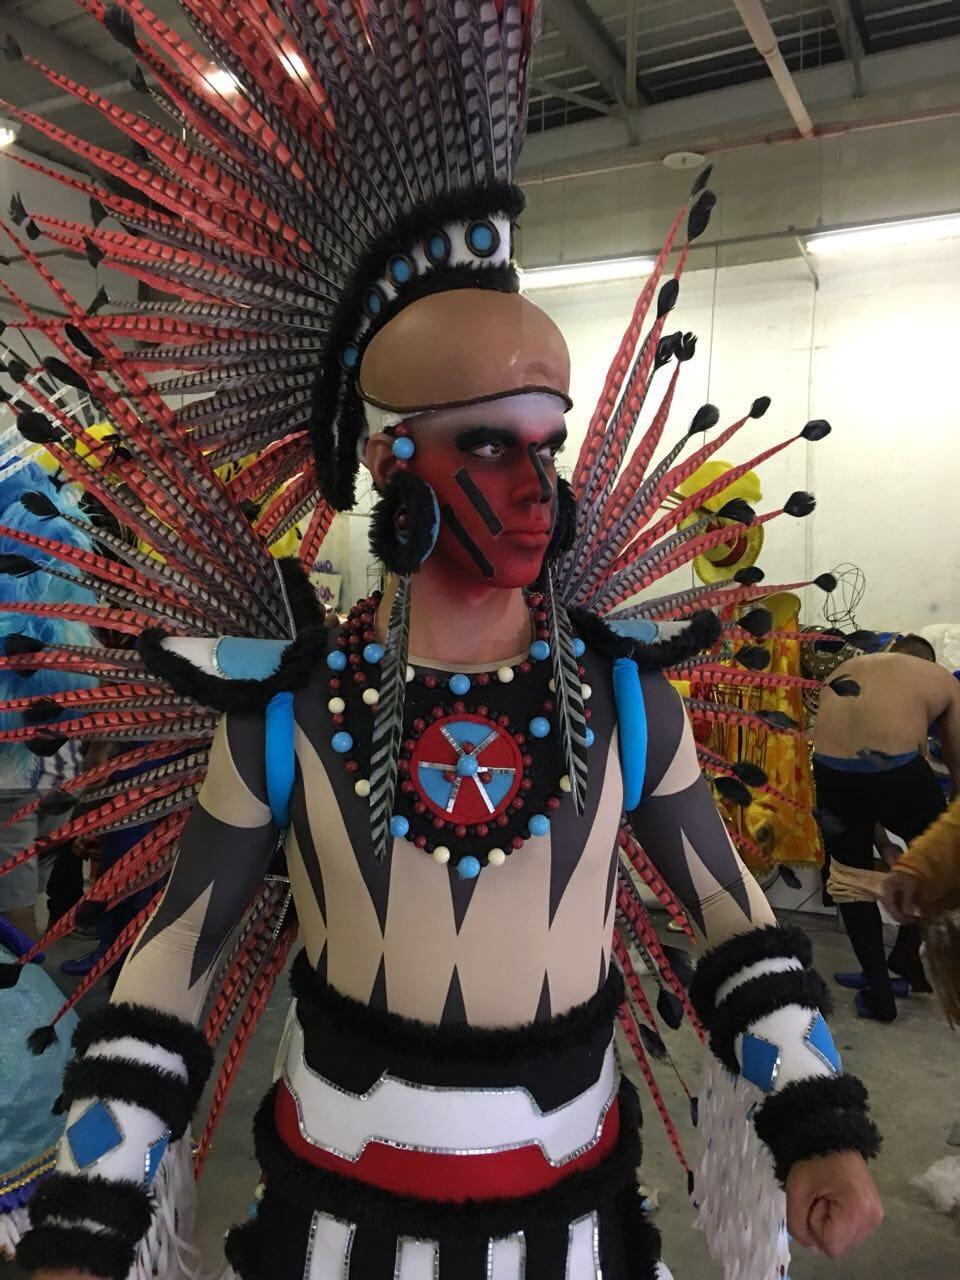 carnaval-de-rio-maquillage-homme